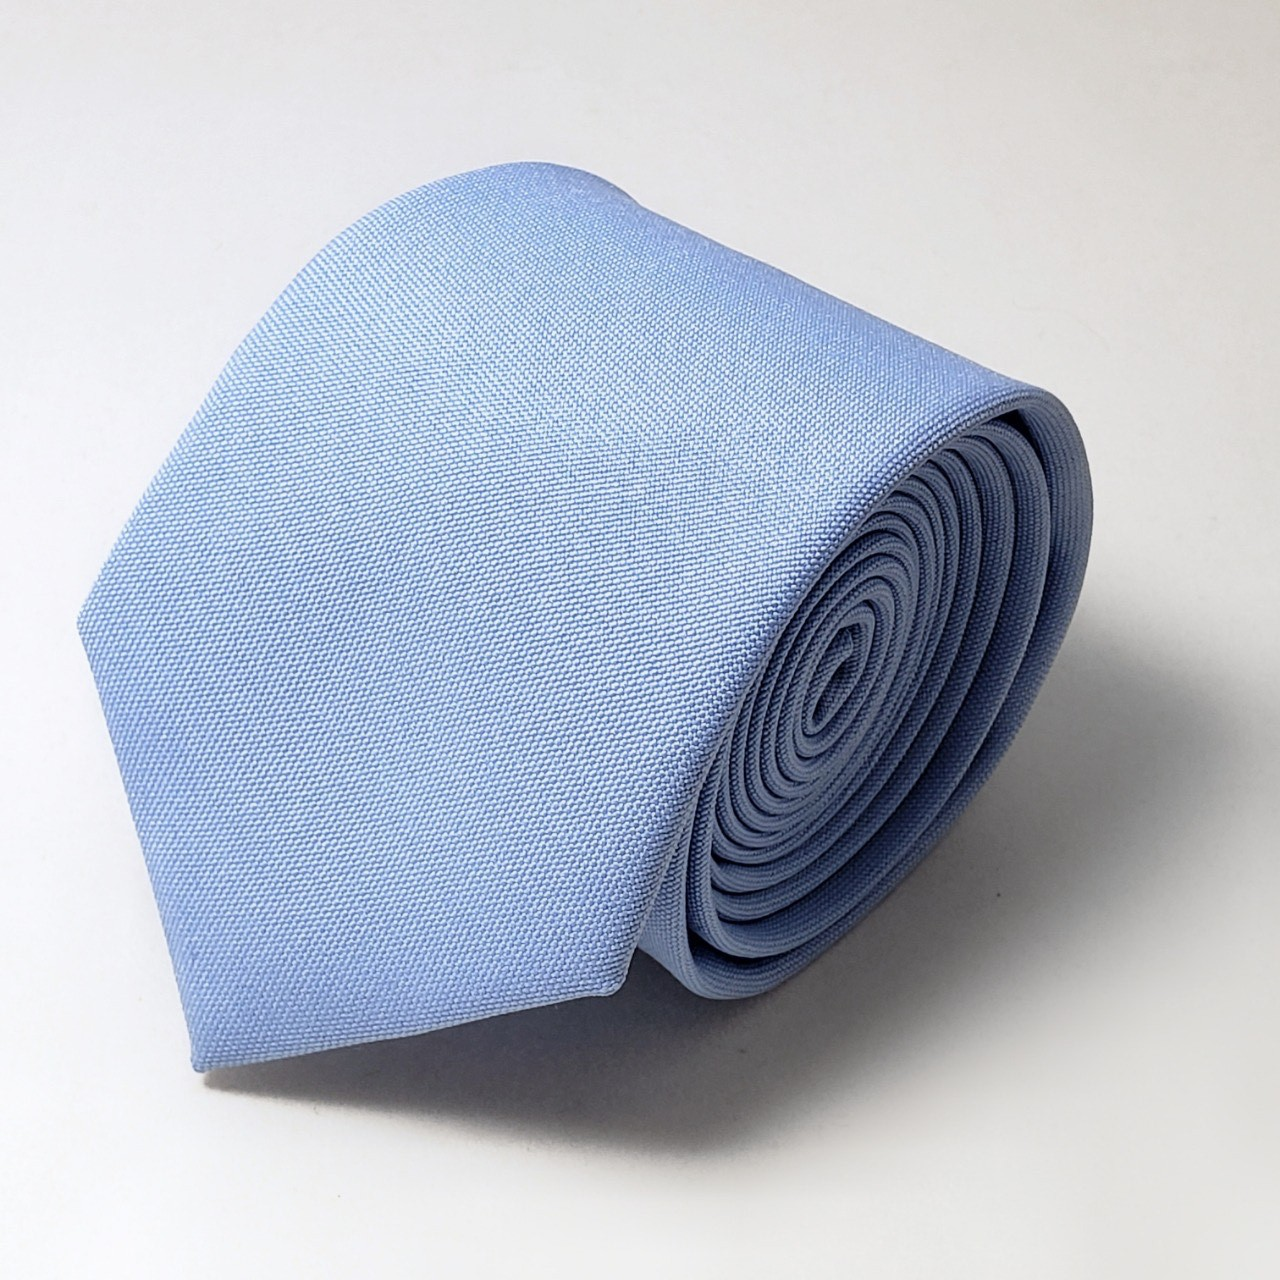 Gravata Azul serenity lisa fosca slin